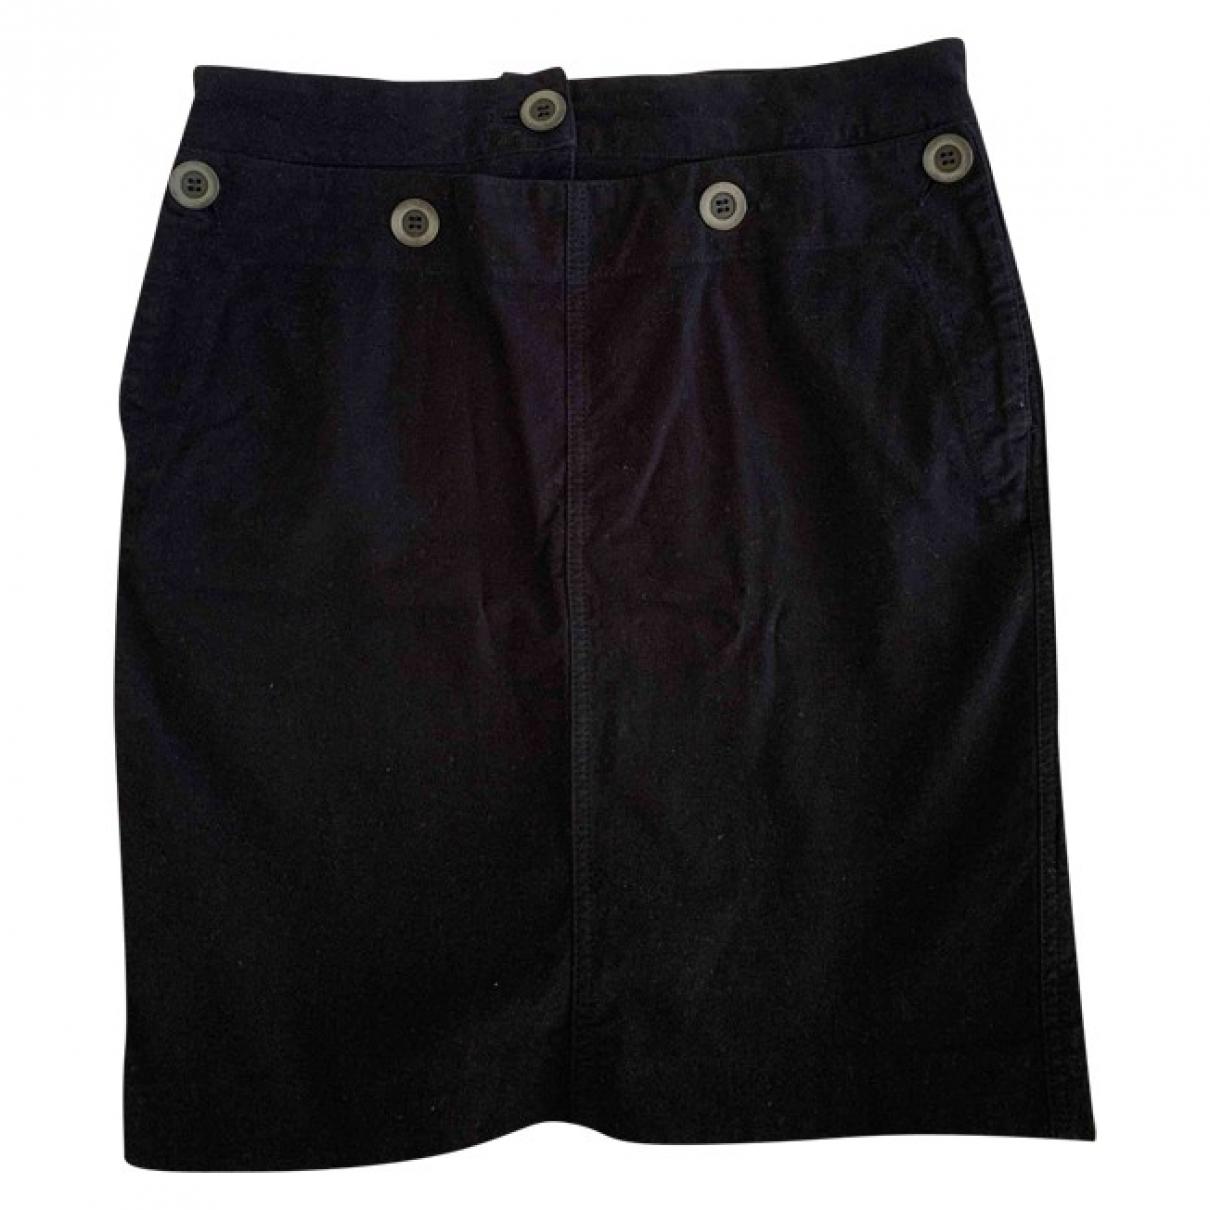 Max & Co \N Black Cotton - elasthane skirt for Women 38 IT